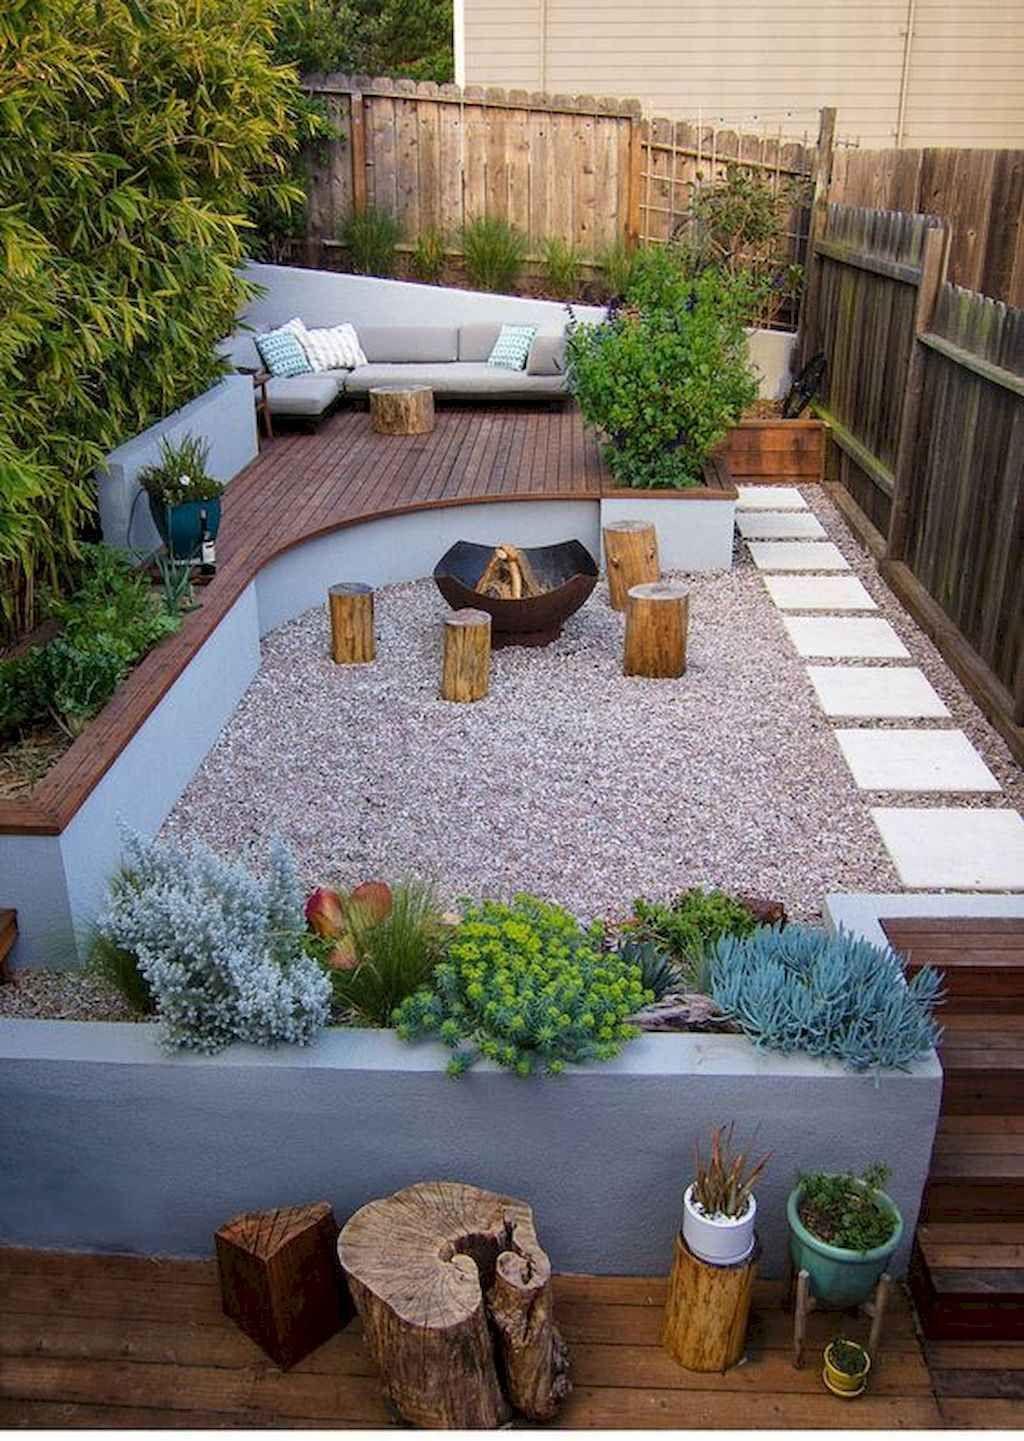 50 Cozy Backyard Seating Area Ideas | Small backyard ... on Back Garden Seating Area Ideas id=63545